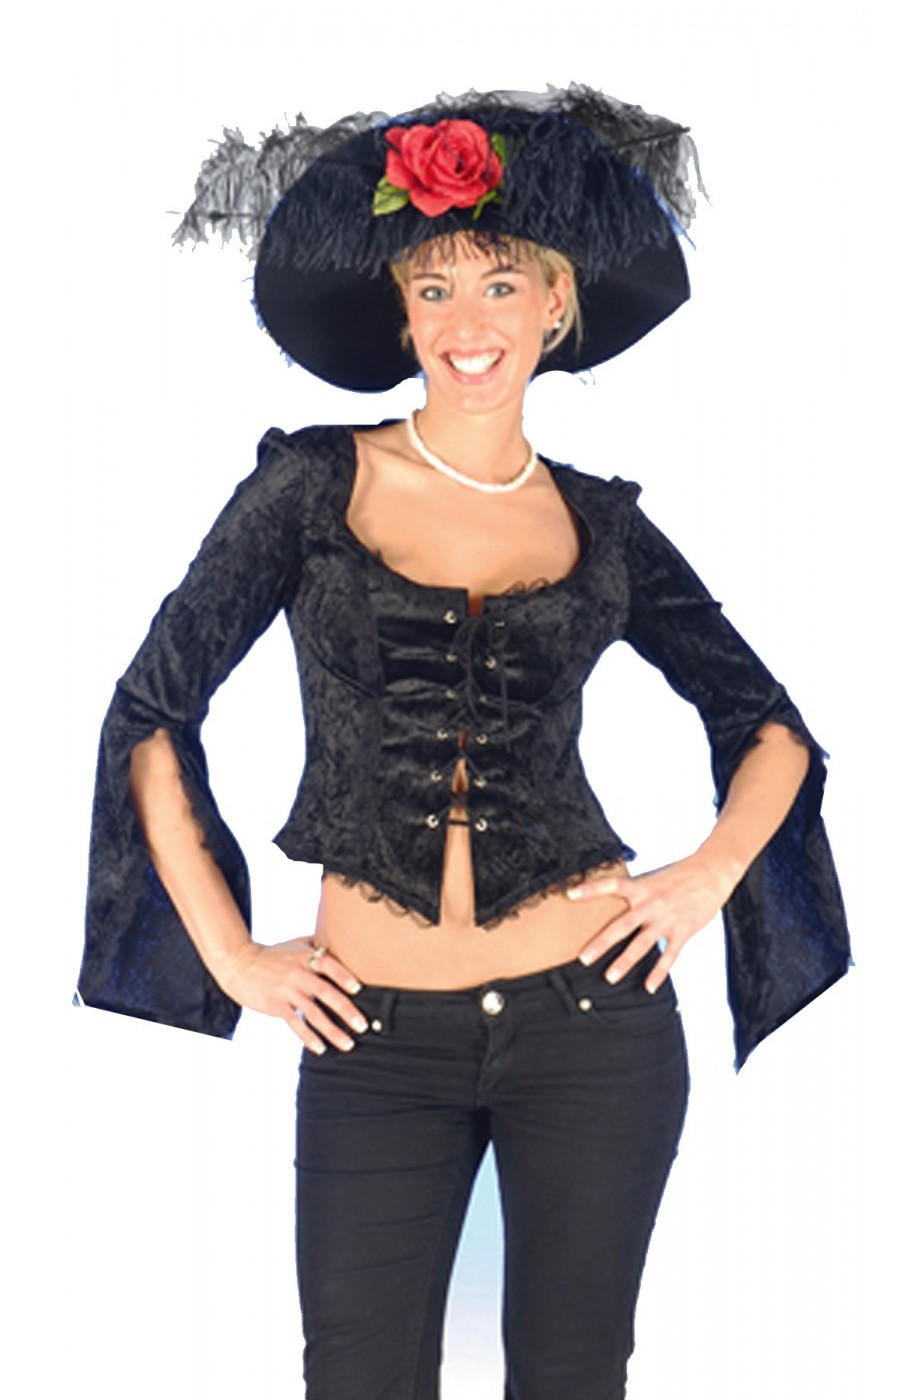 Camicia donna nera pirata/800/burlesque/strega